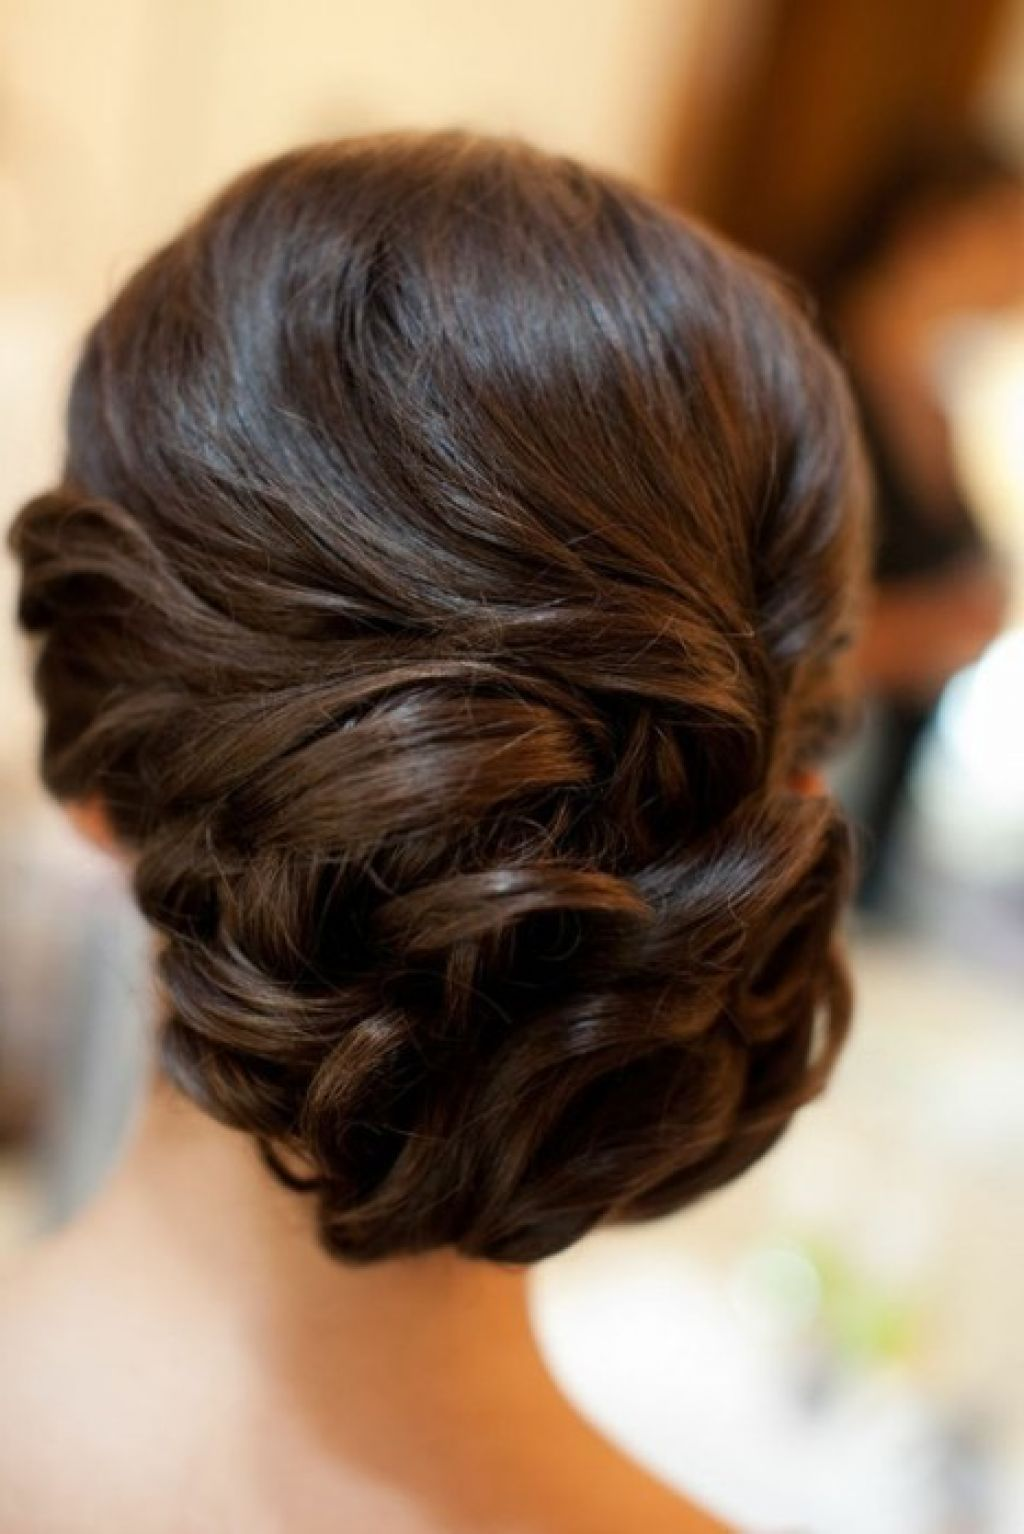 20 wedding hairstyles for brown hair ideas | wedding hair